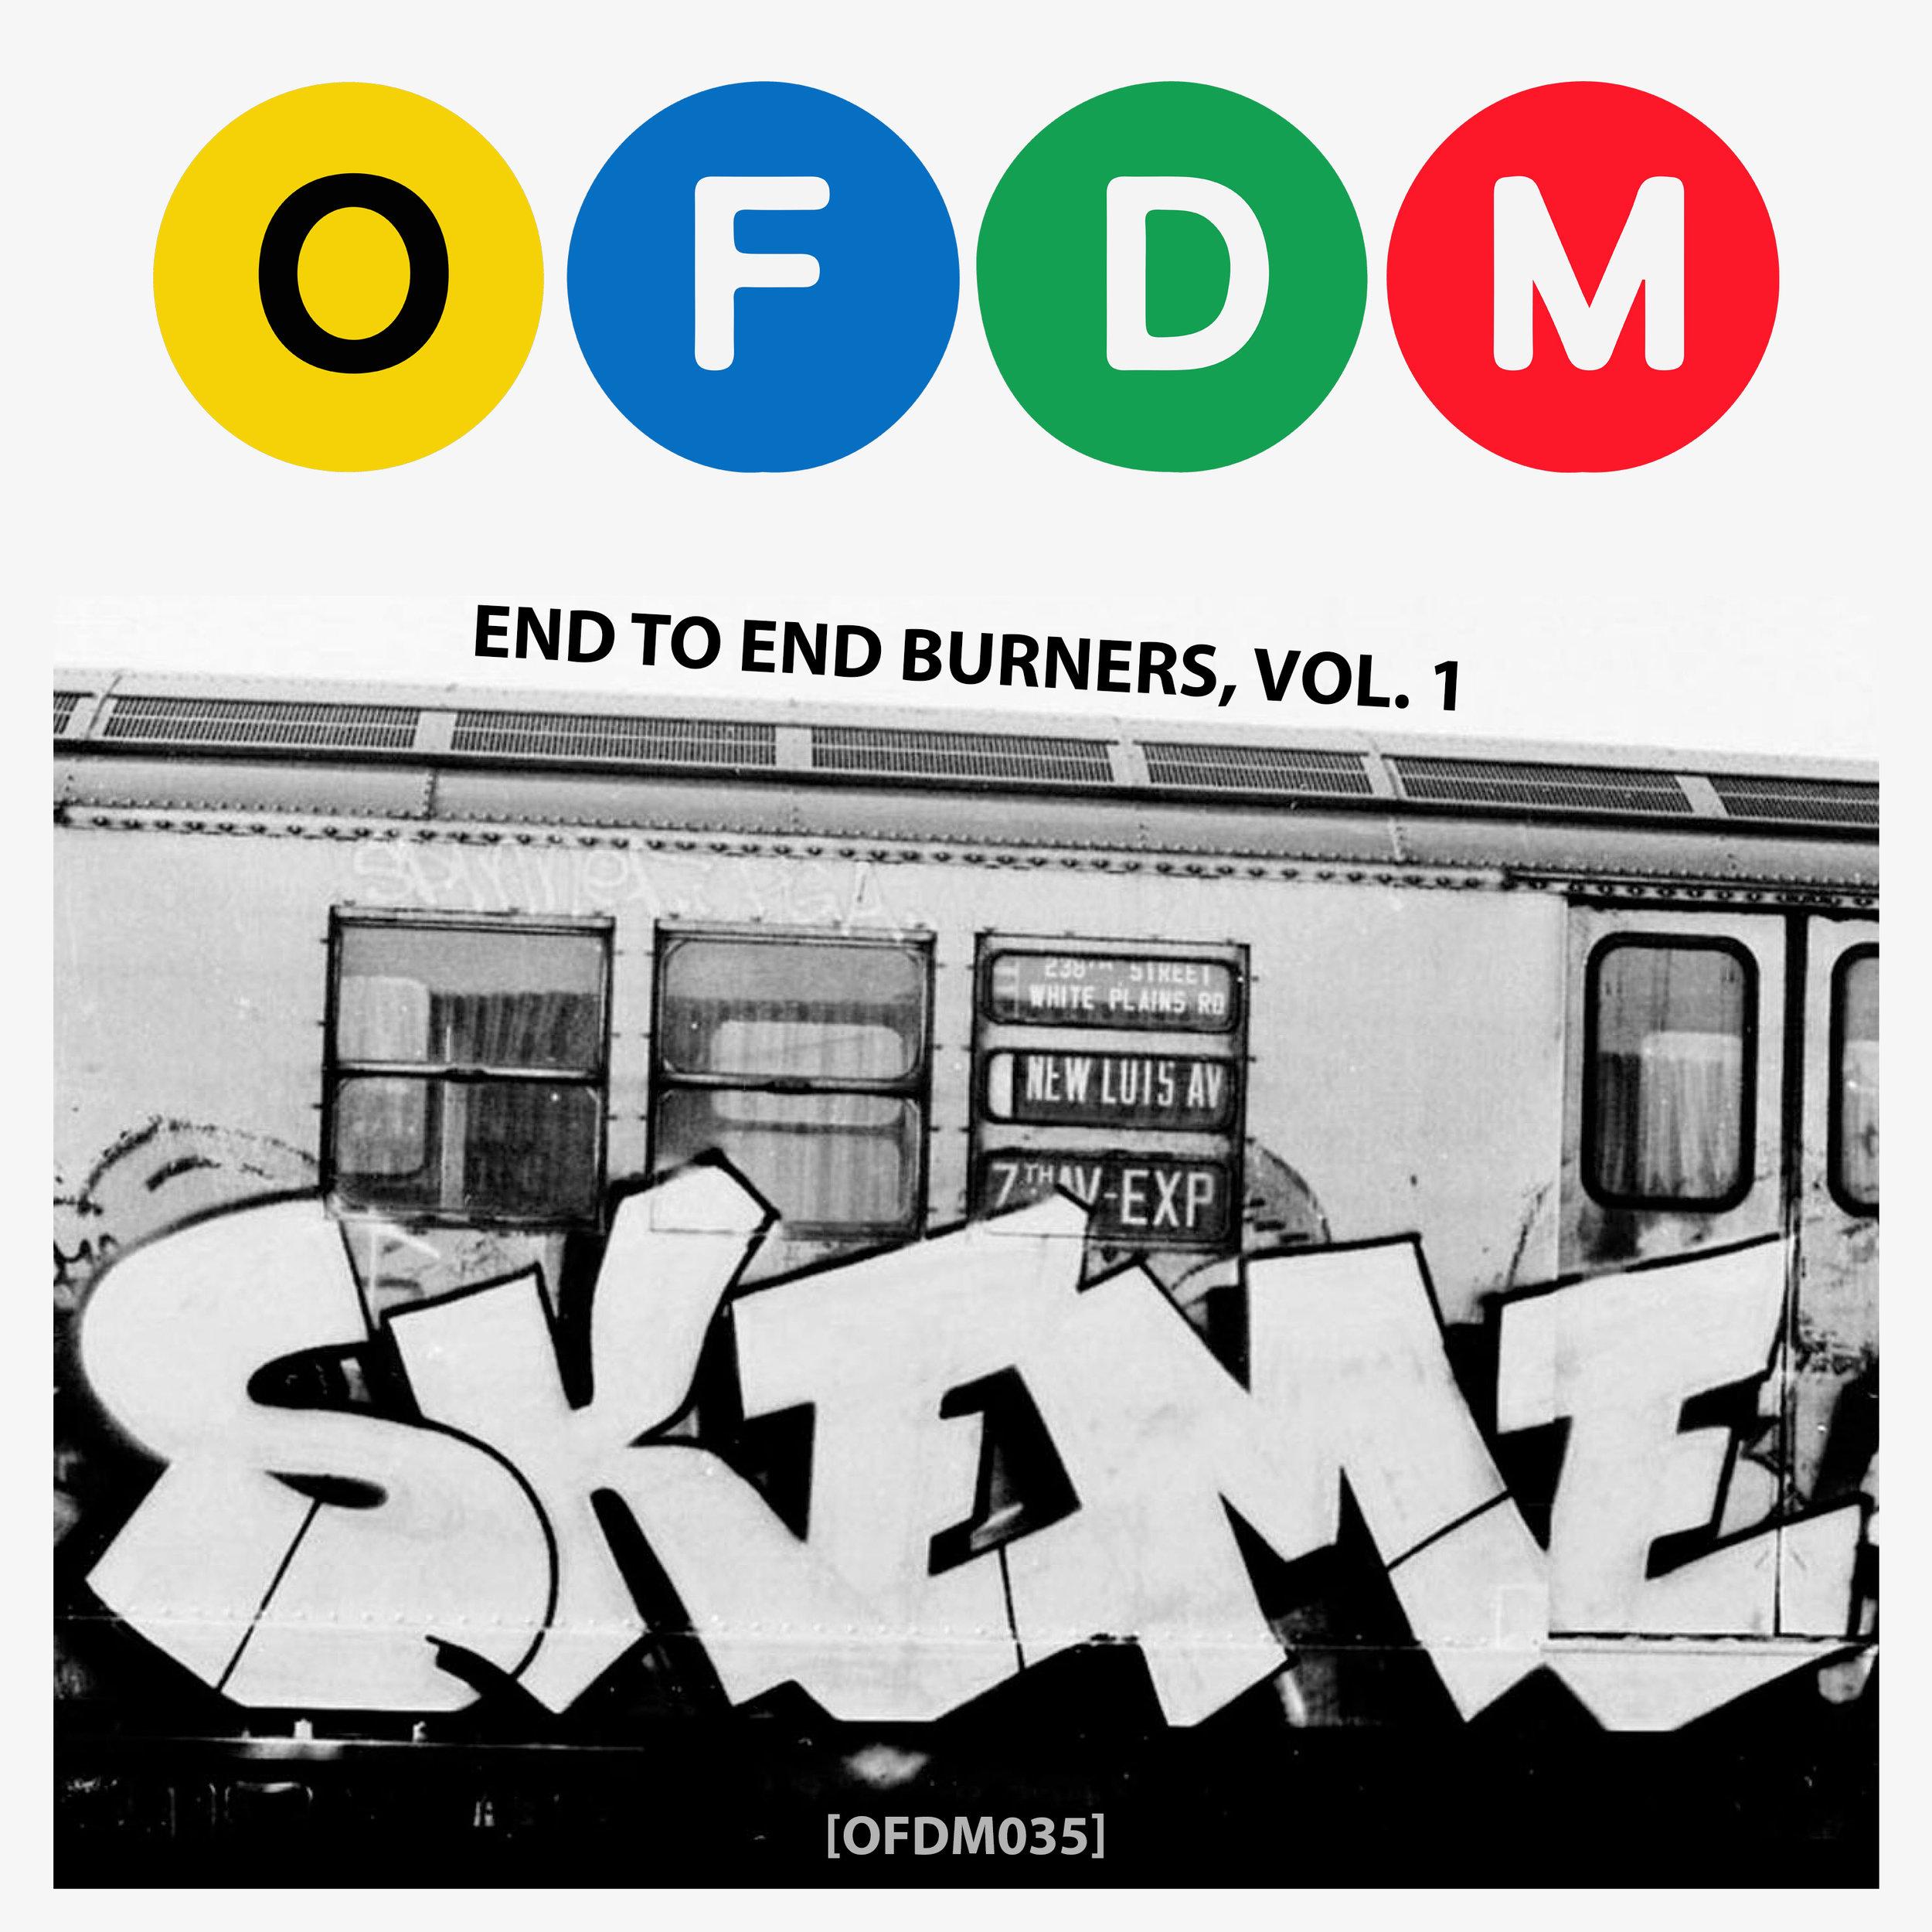 [OFDM035] VA - End To End Burners, Vol. 1 (ARTWORK).jpg